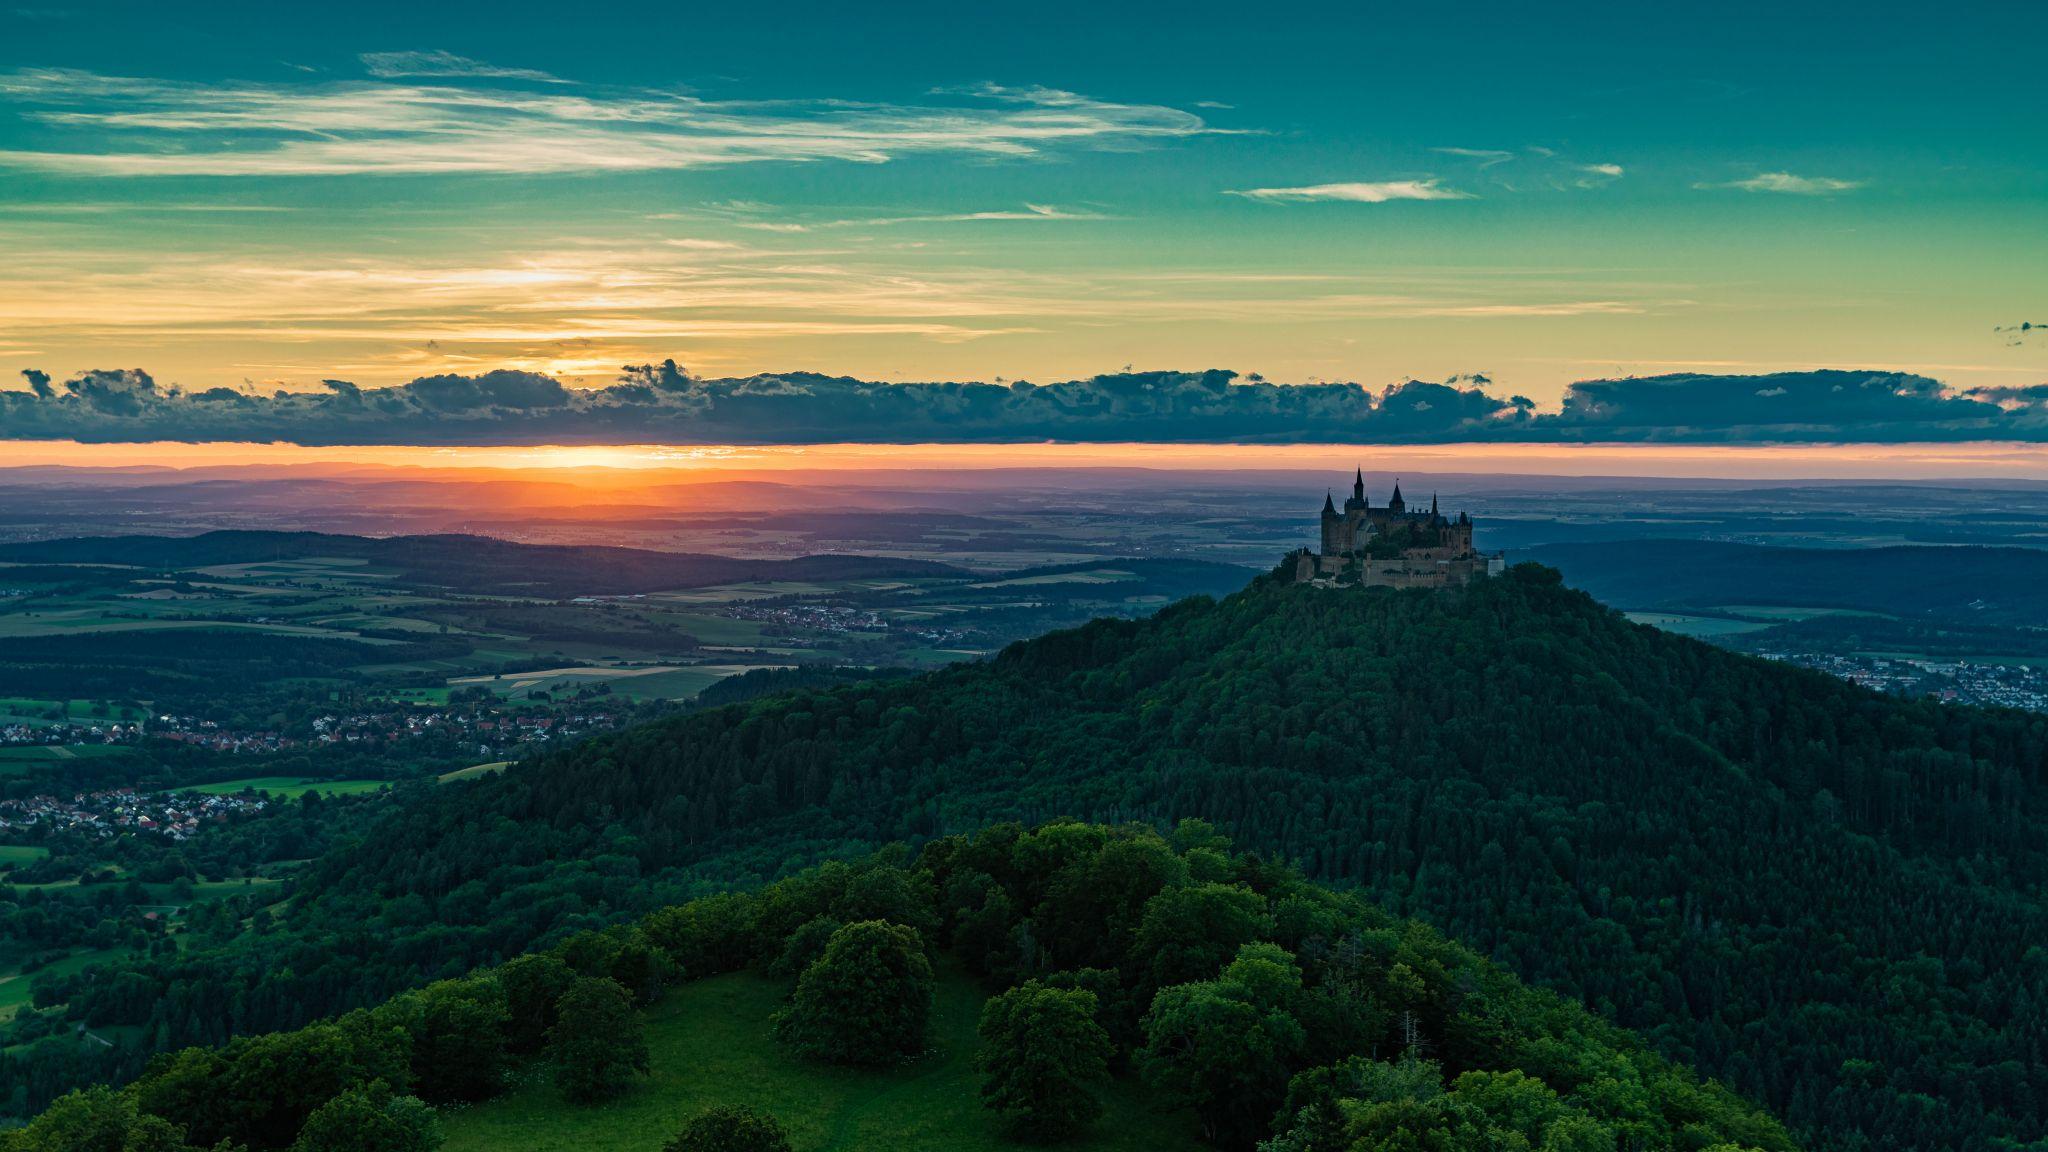 Sunset - view from Zeller Horn, Germany